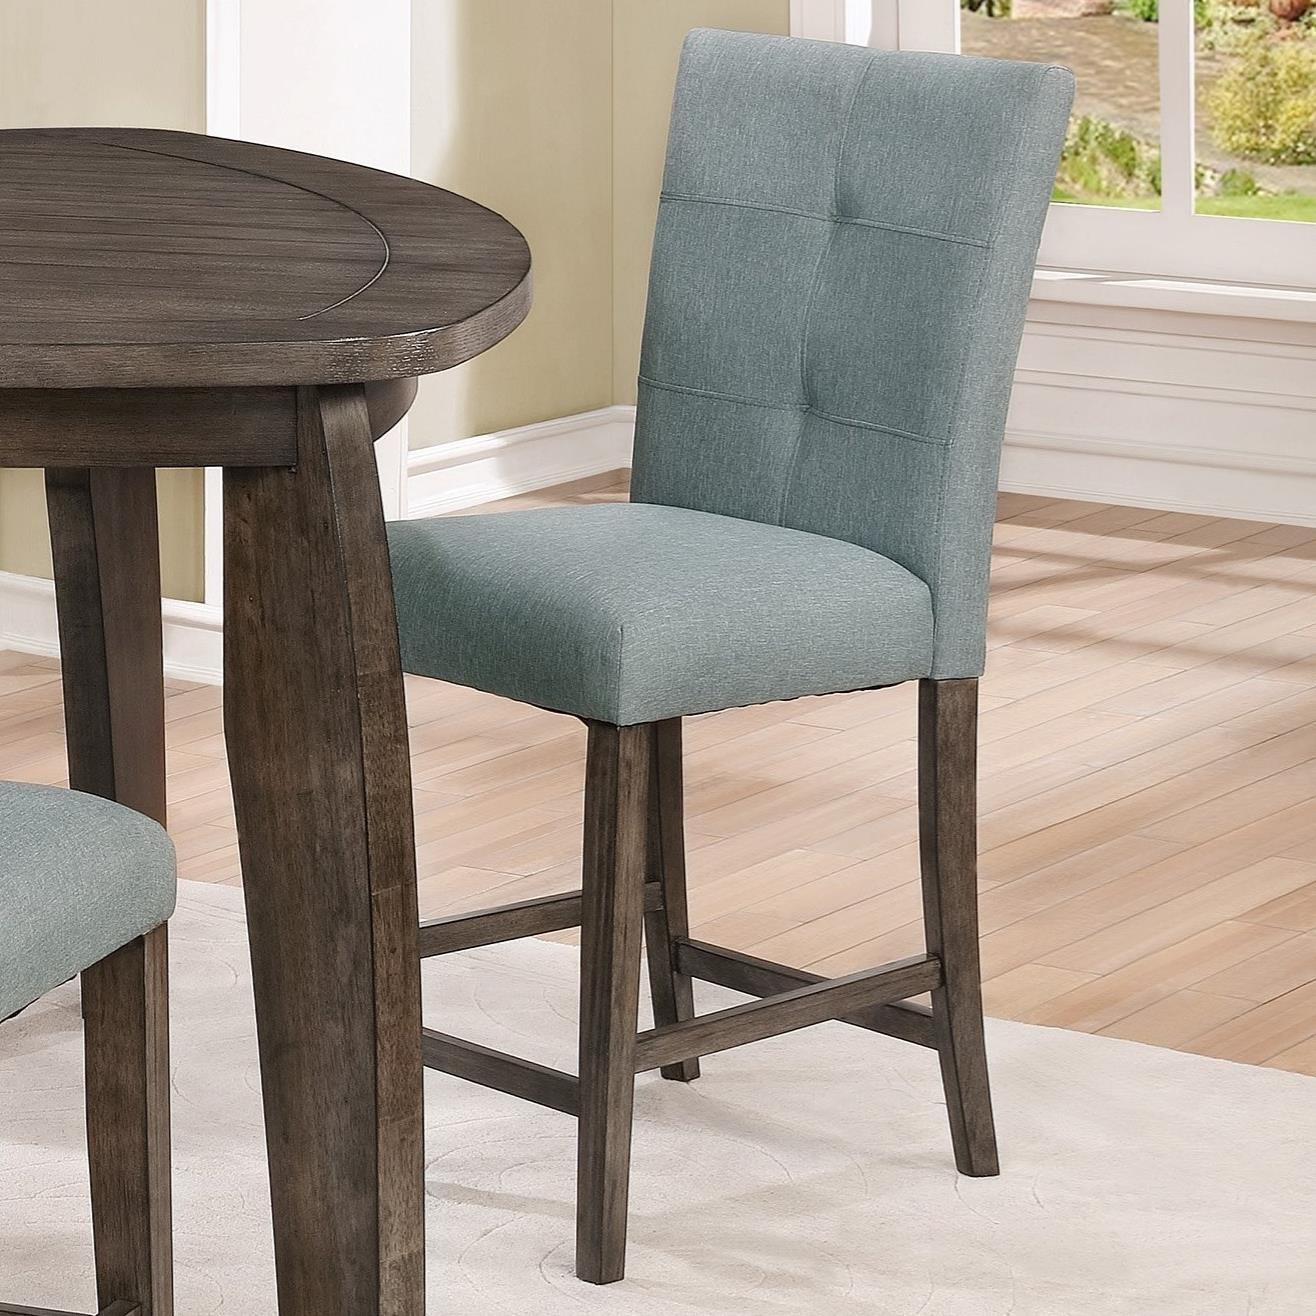 upholstered counter height chairs metal chair rail molding crown mark hollis bullard furniture bar stools fayetteville nc